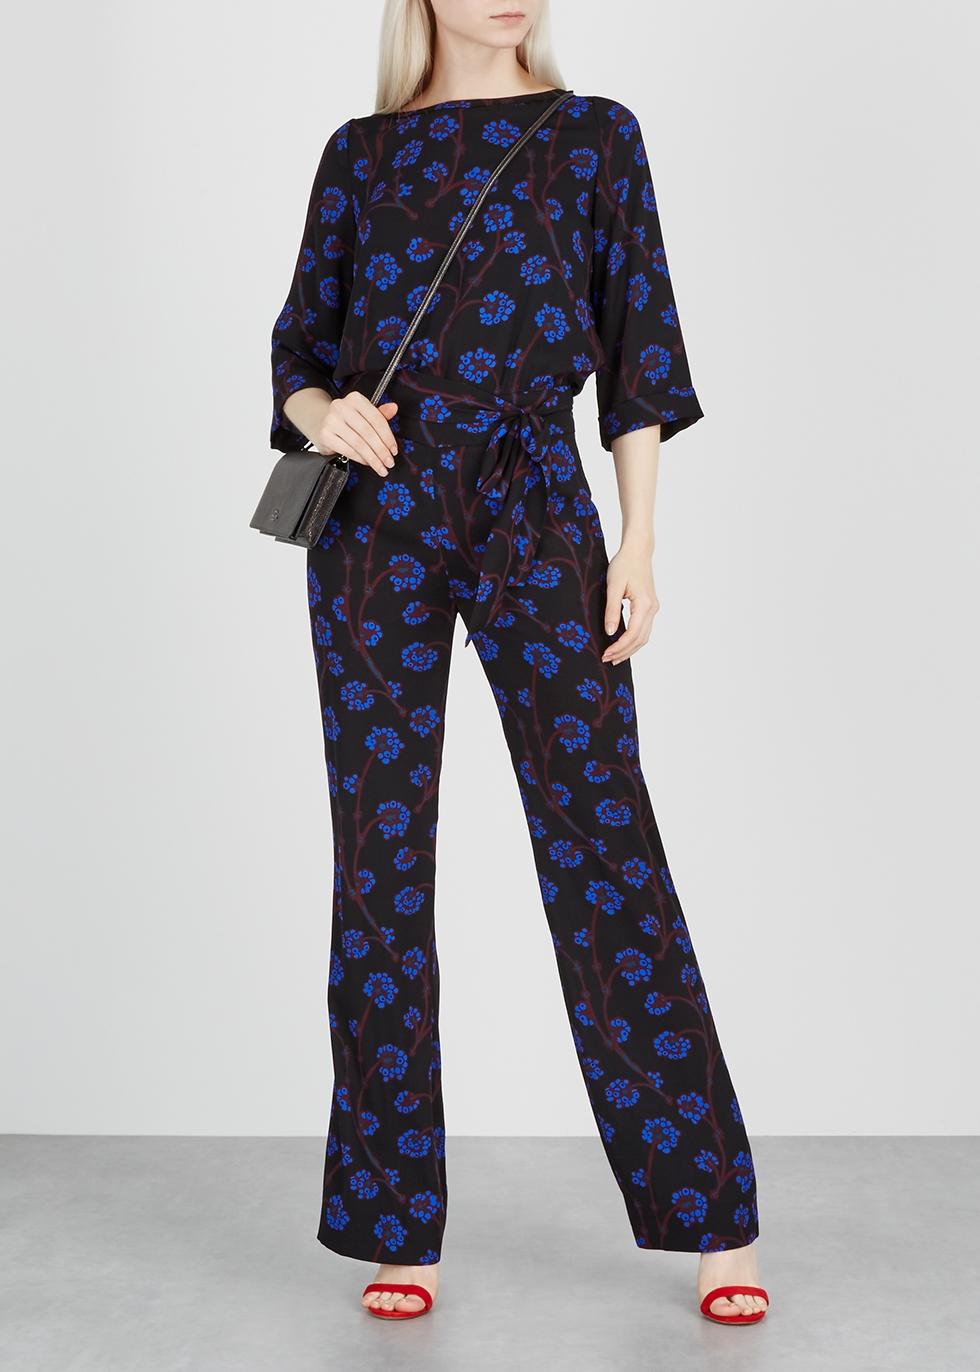 0b181dc27696 Designer Jumpsuits and Luxury Playsuits - Harvey Nichols